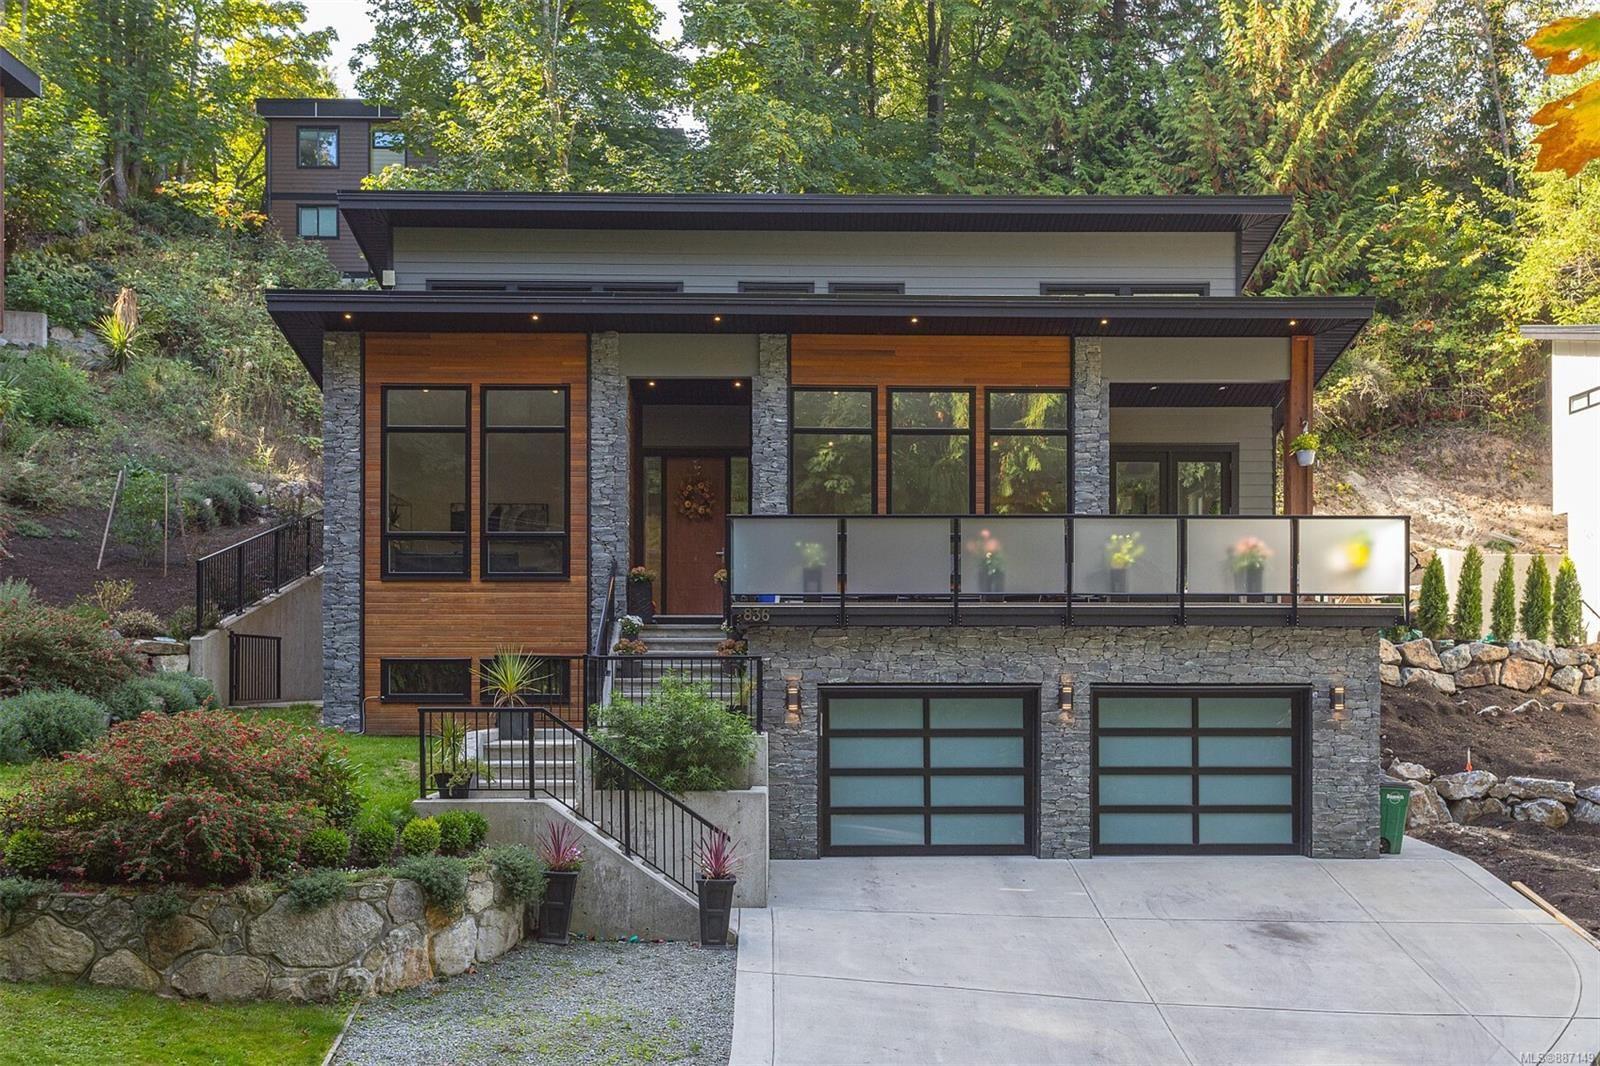 Main Photo: 836 Haliburton Rd in Saanich: SE Cordova Bay House for sale (Saanich East)  : MLS®# 887149